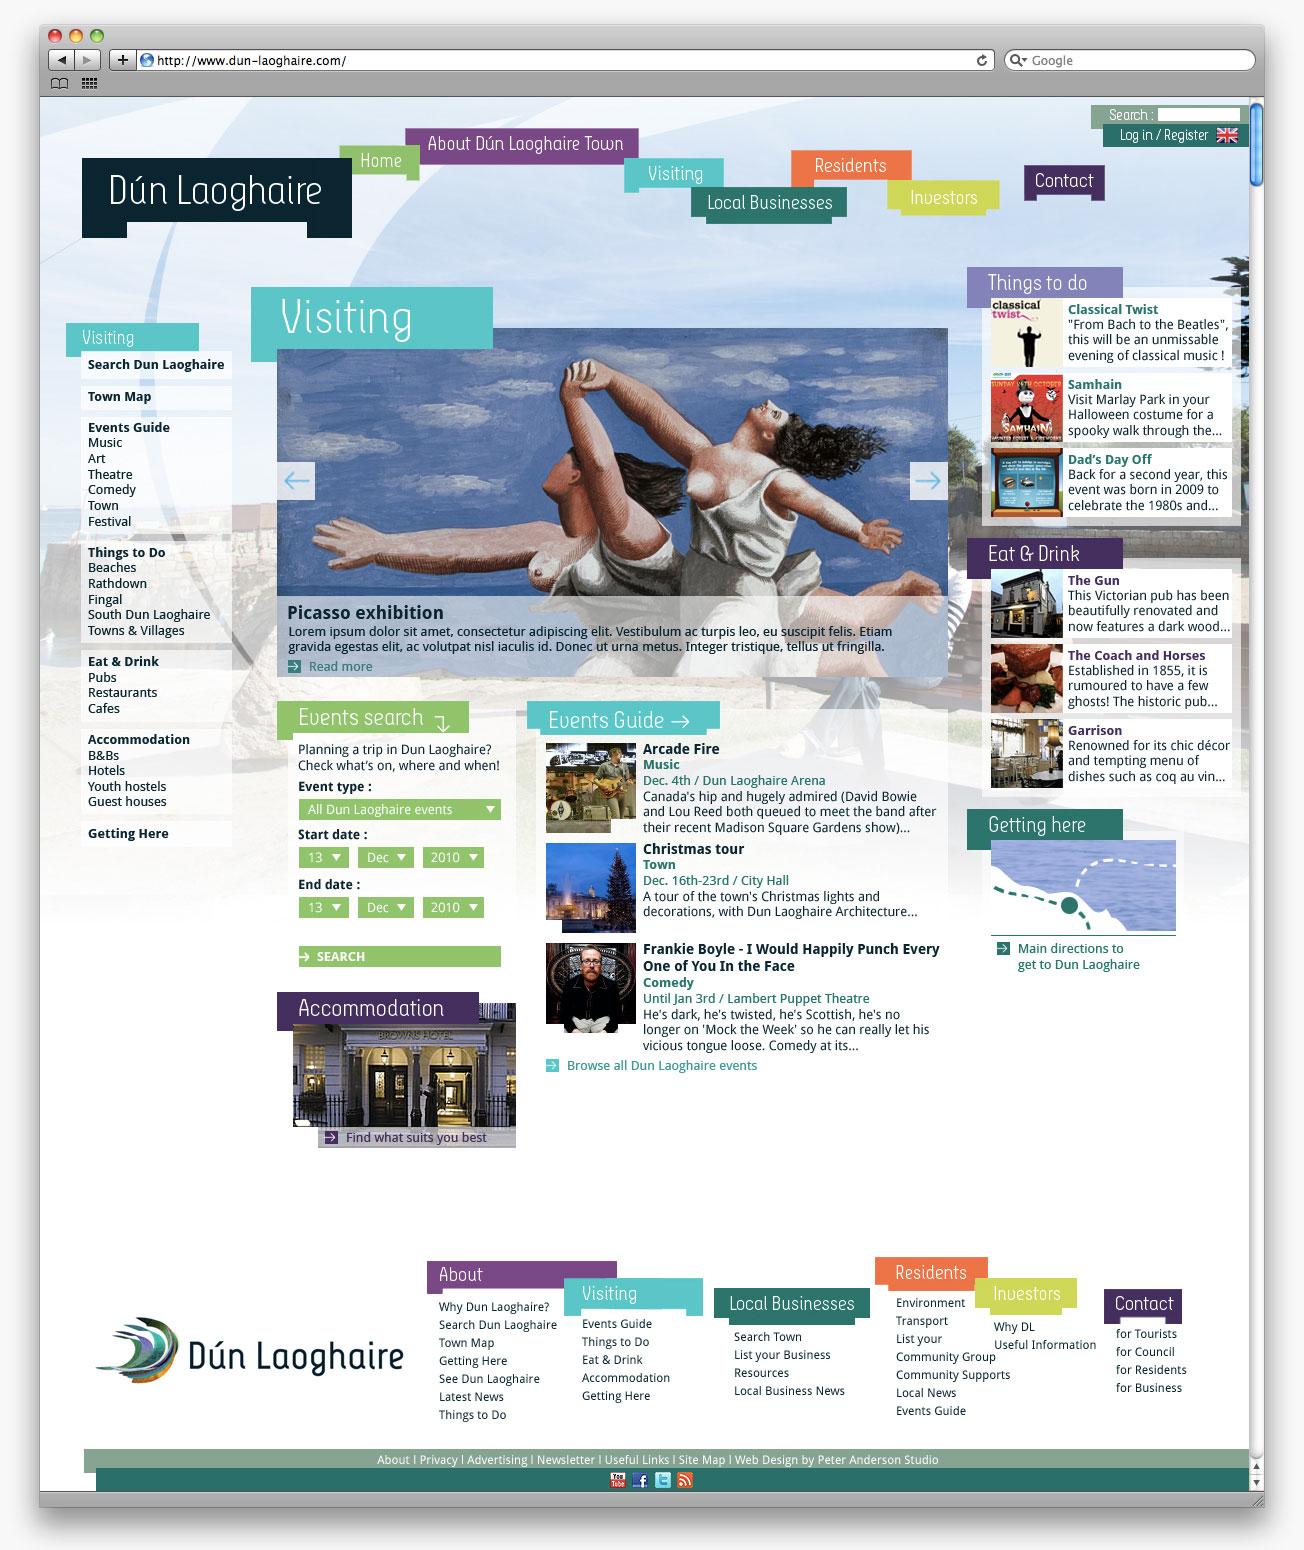 Dunleary-website---max-V9-landing-page-BG